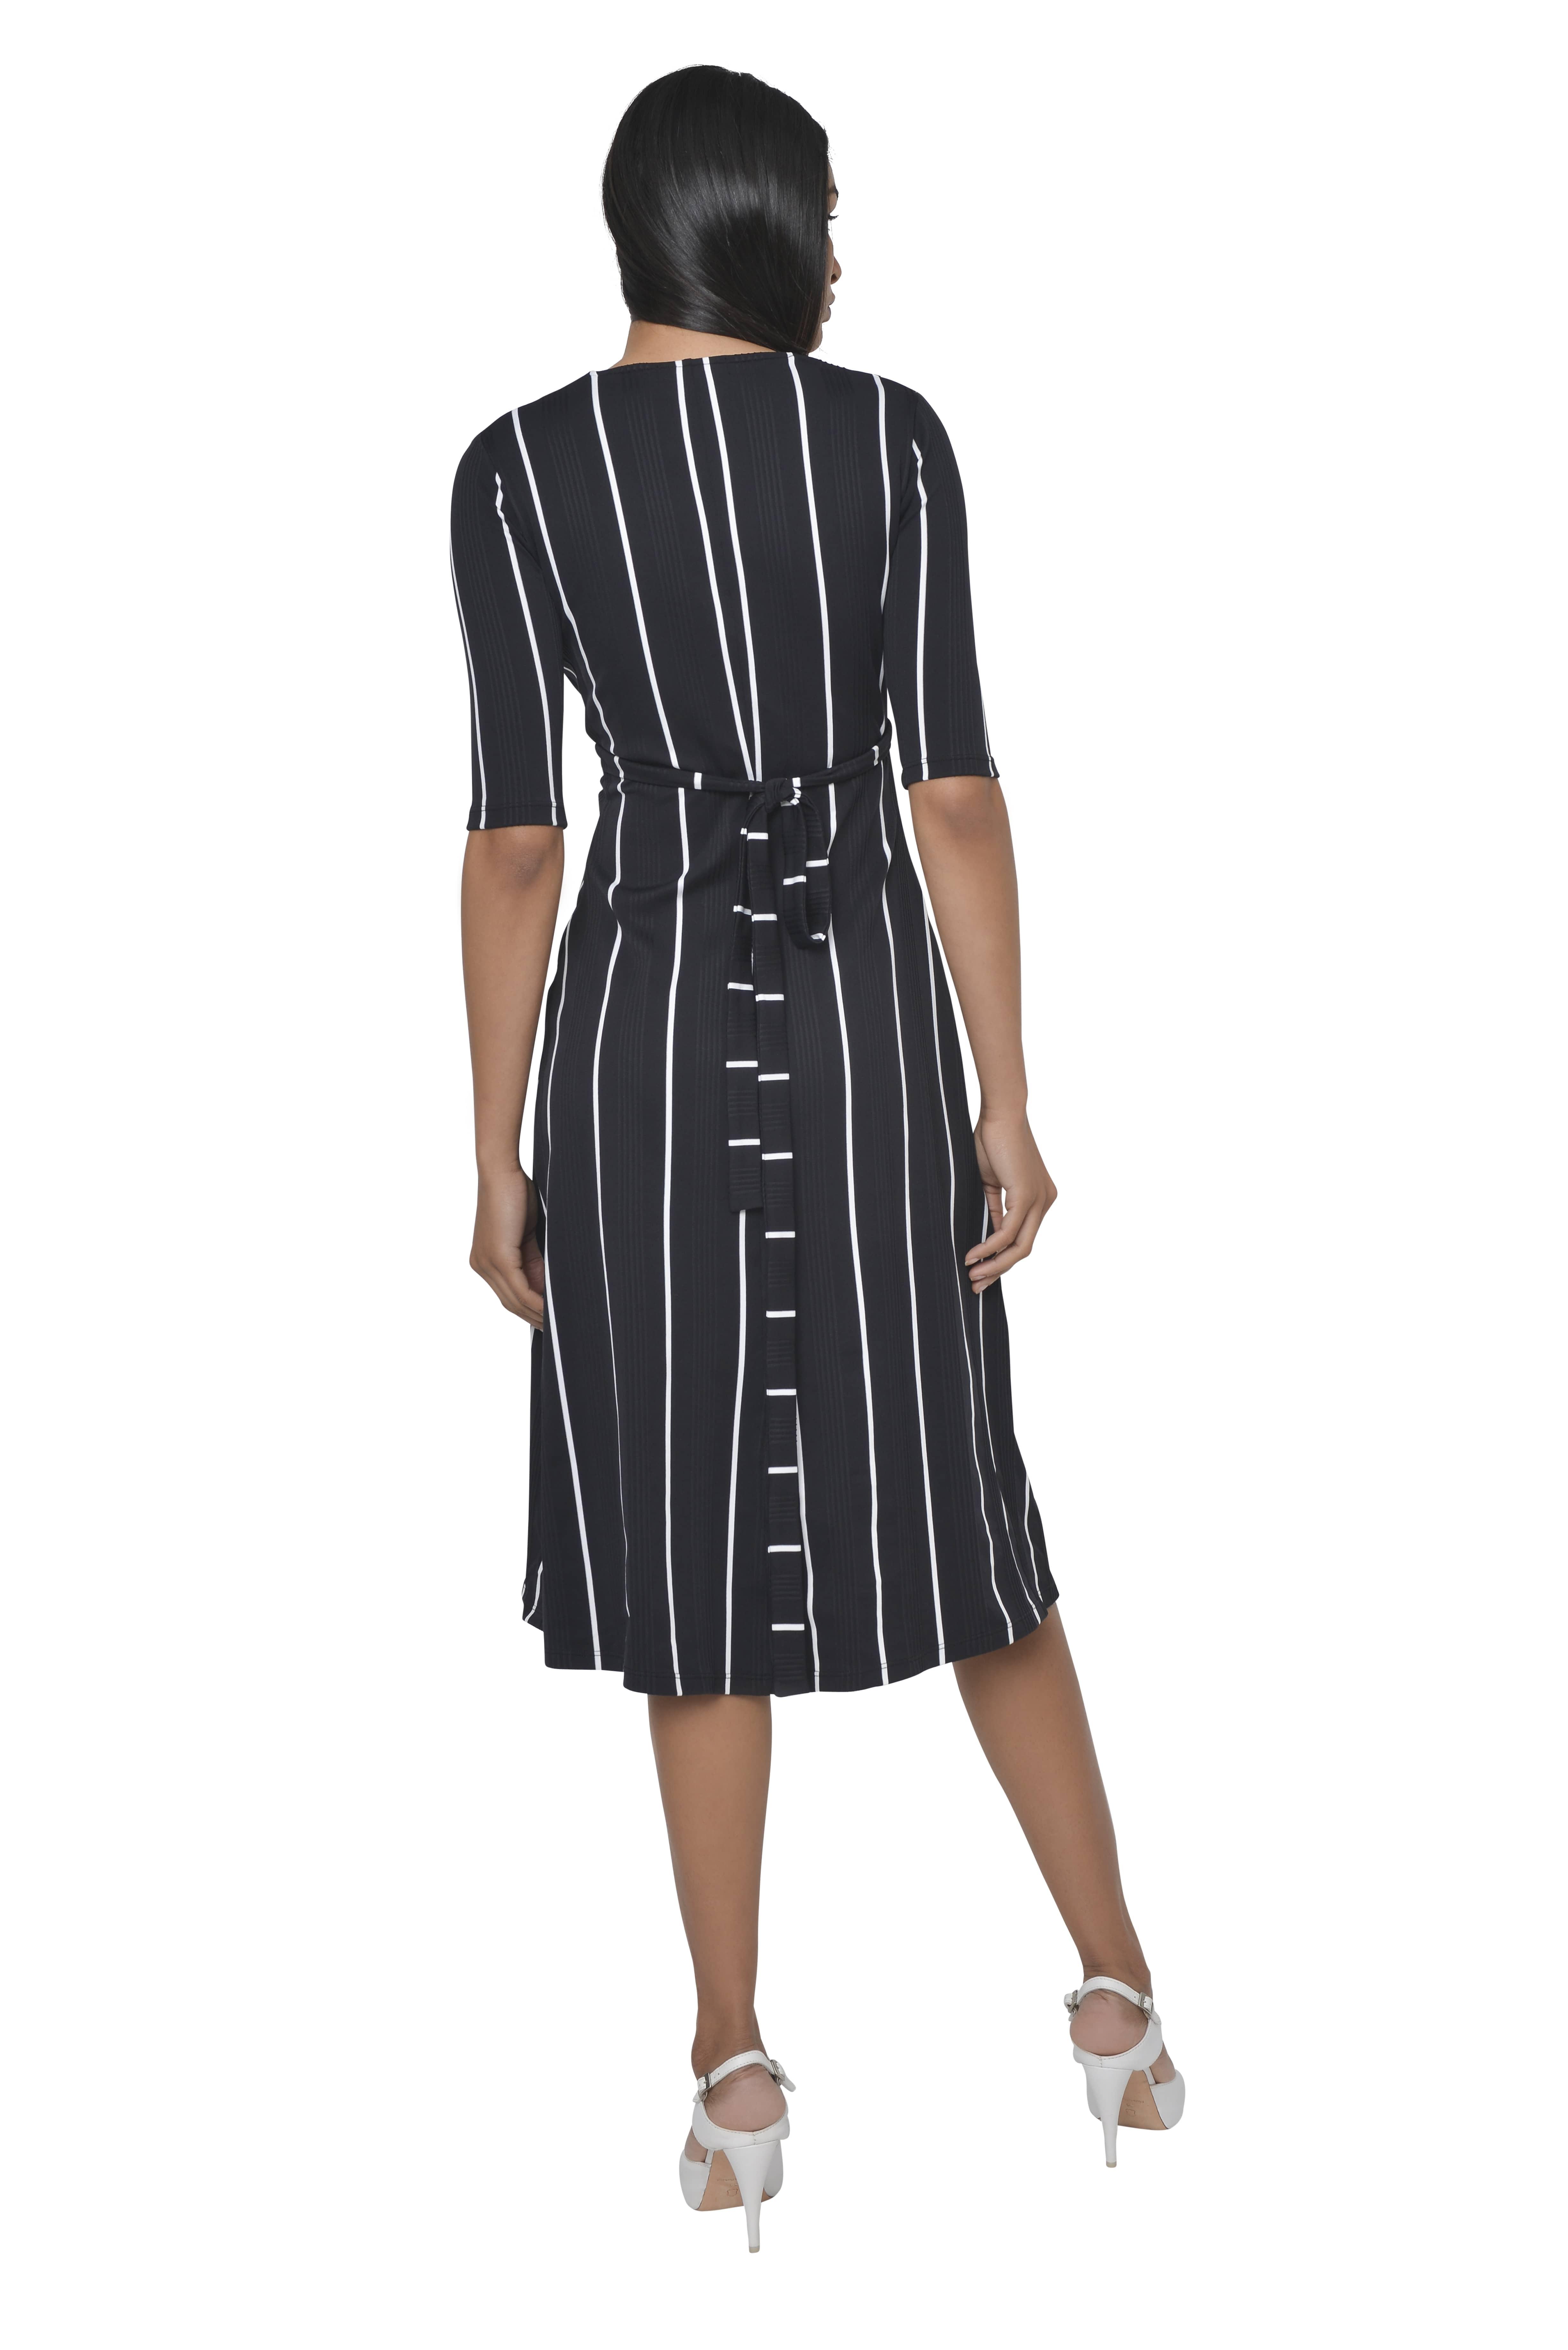 Dress AGAPANTO 2